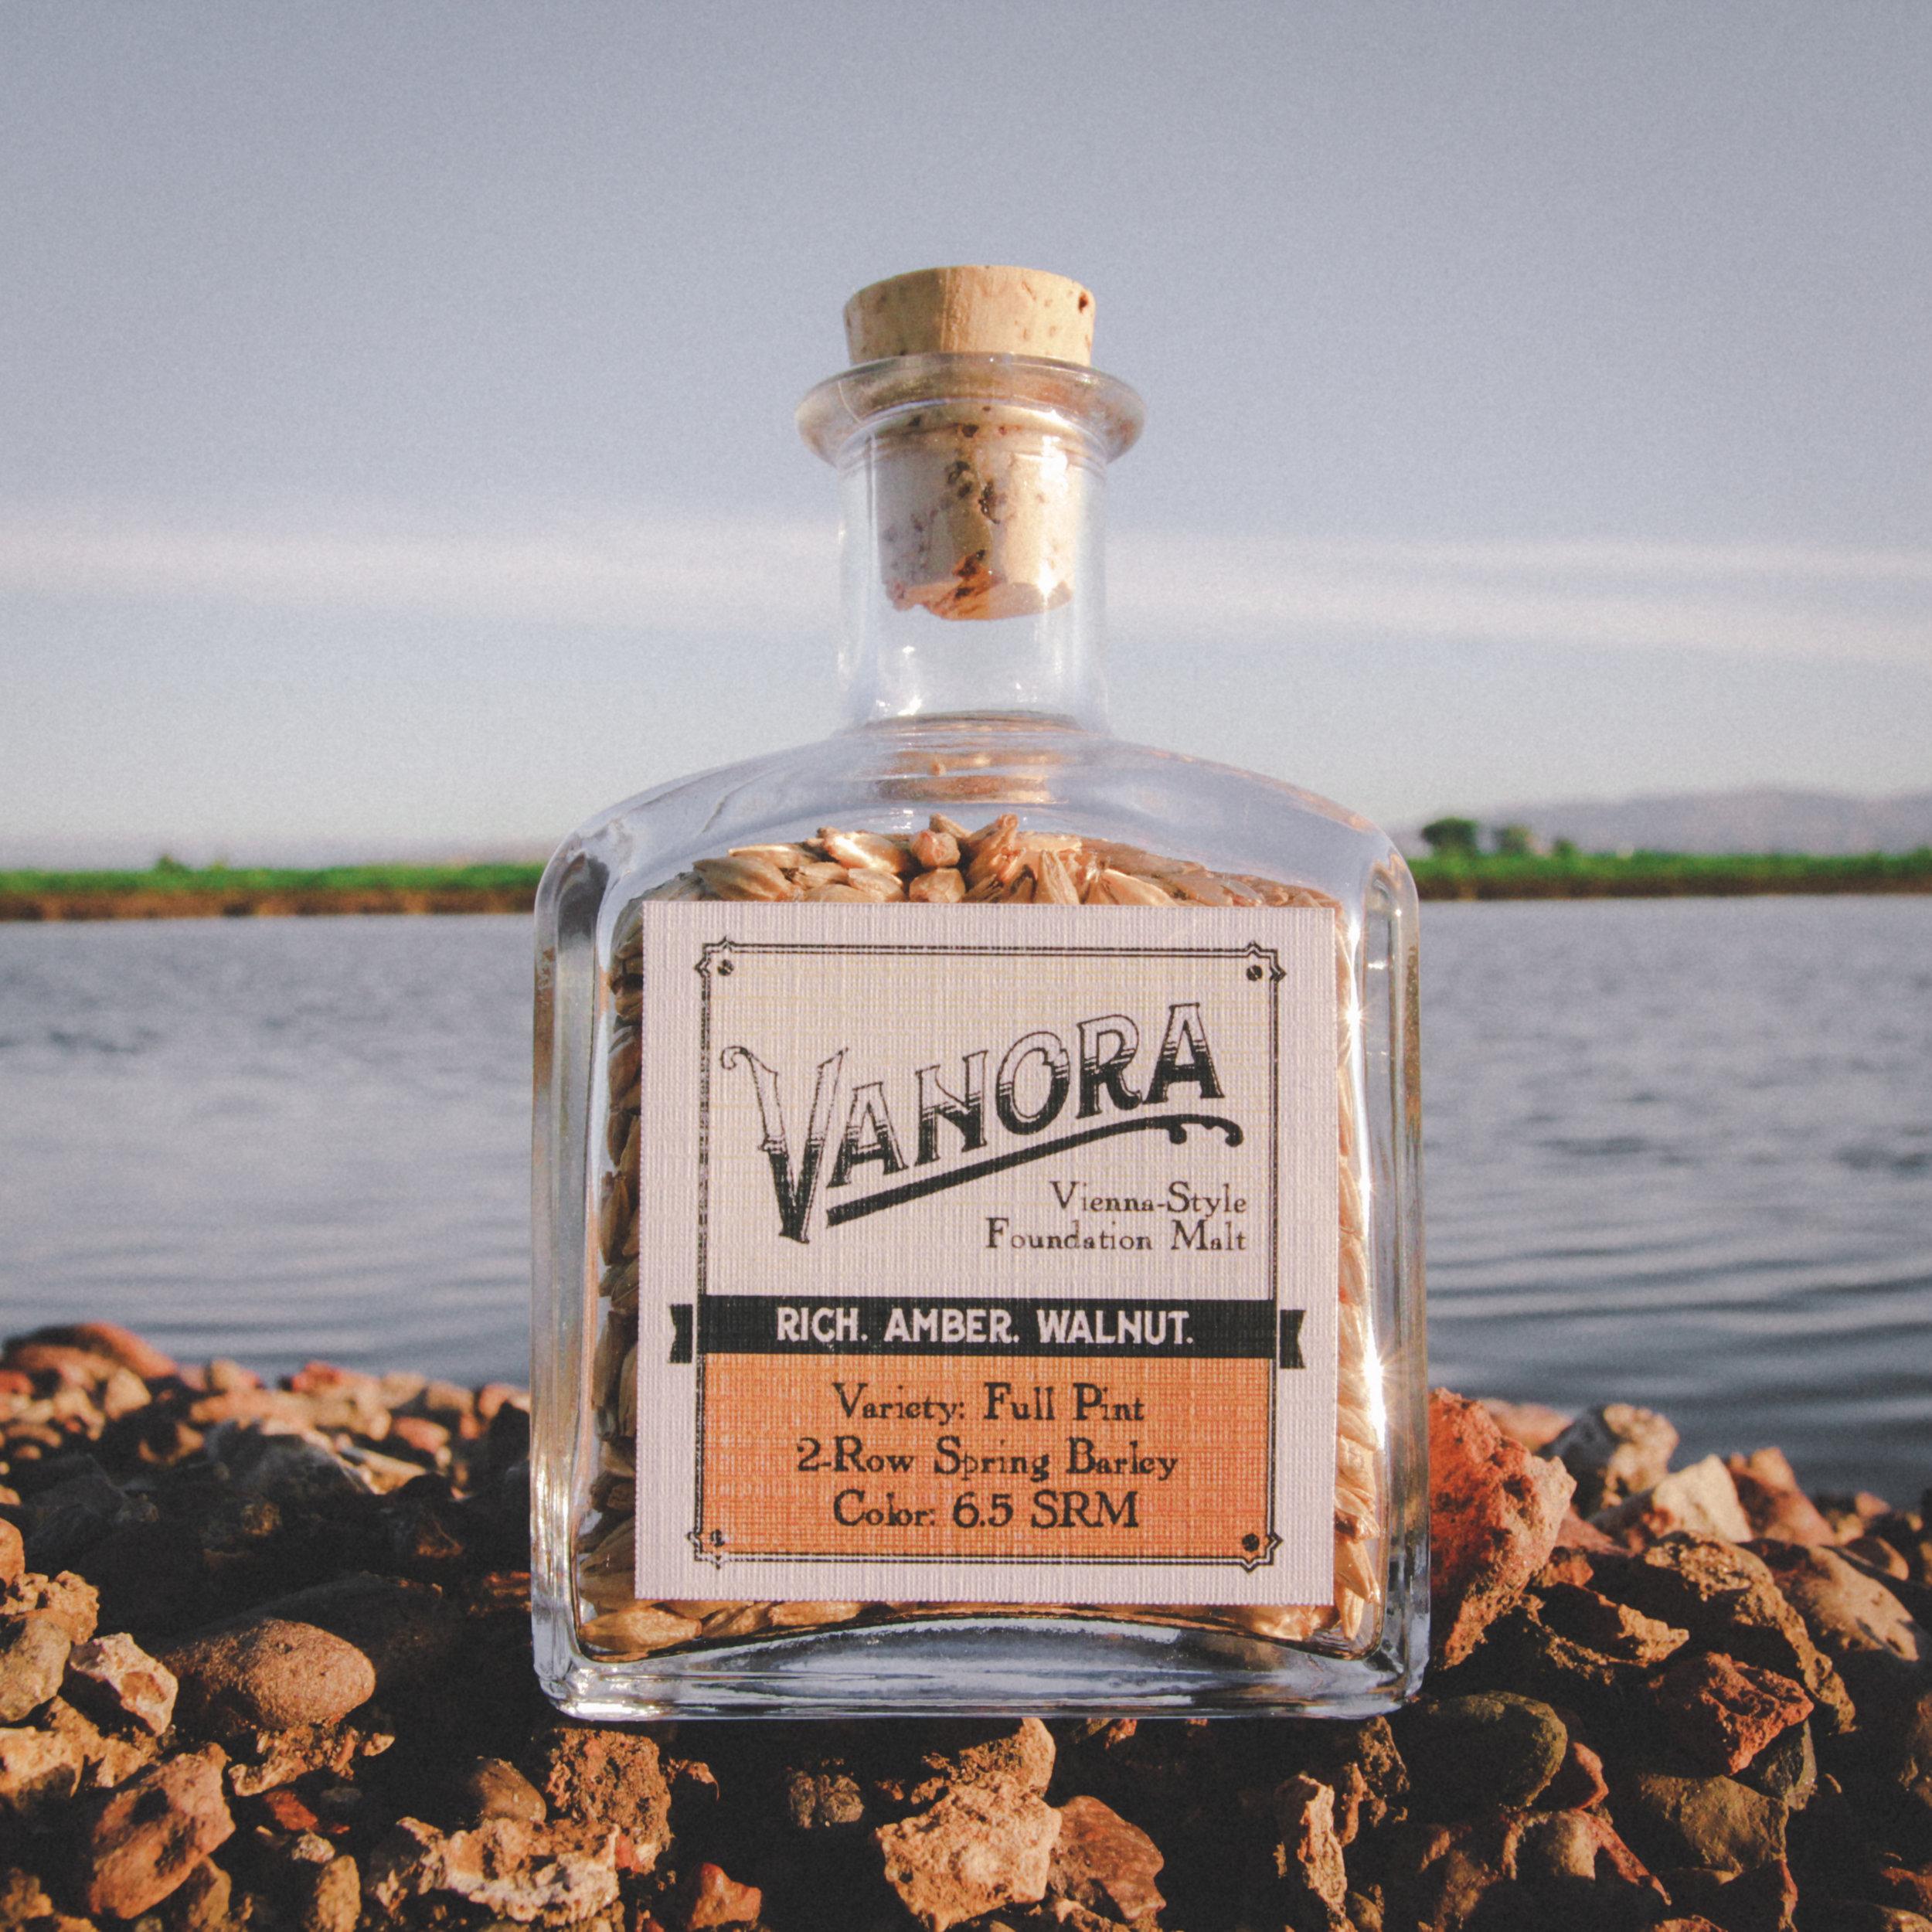 Vanora Vienna Style Malt from Mecca Grade Estate Malt in Madras Oregon